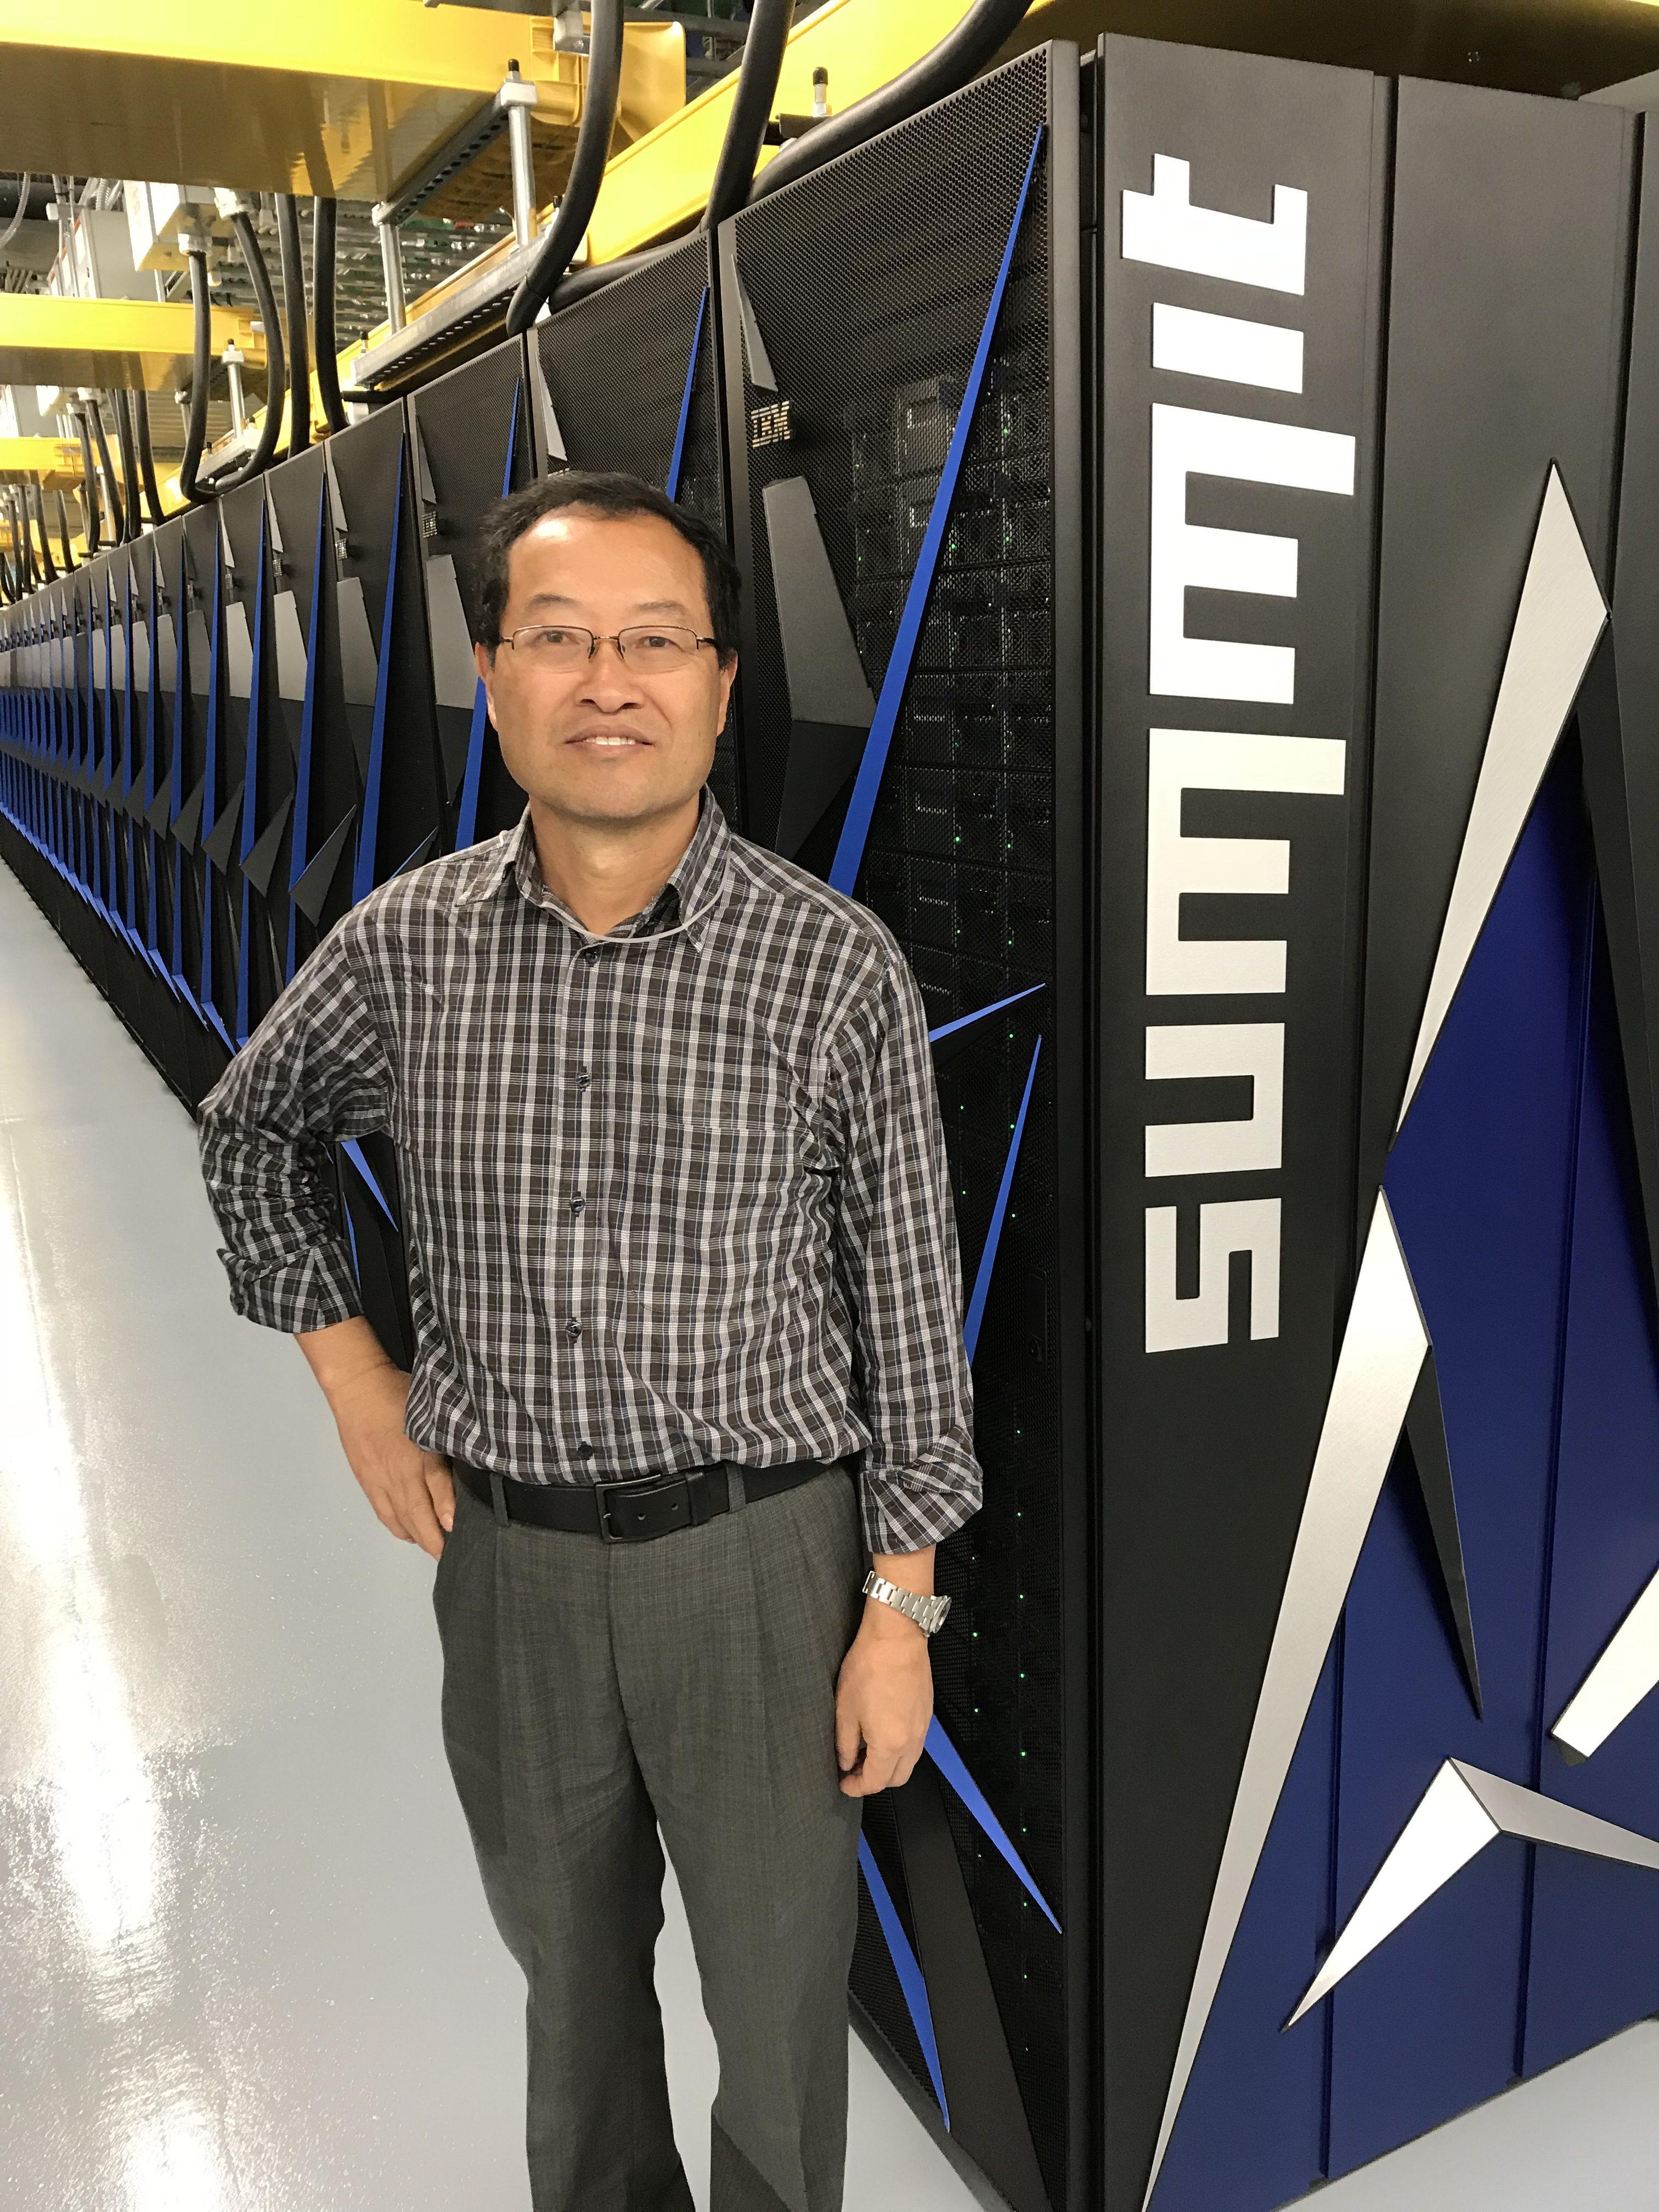 Scientist with super computer